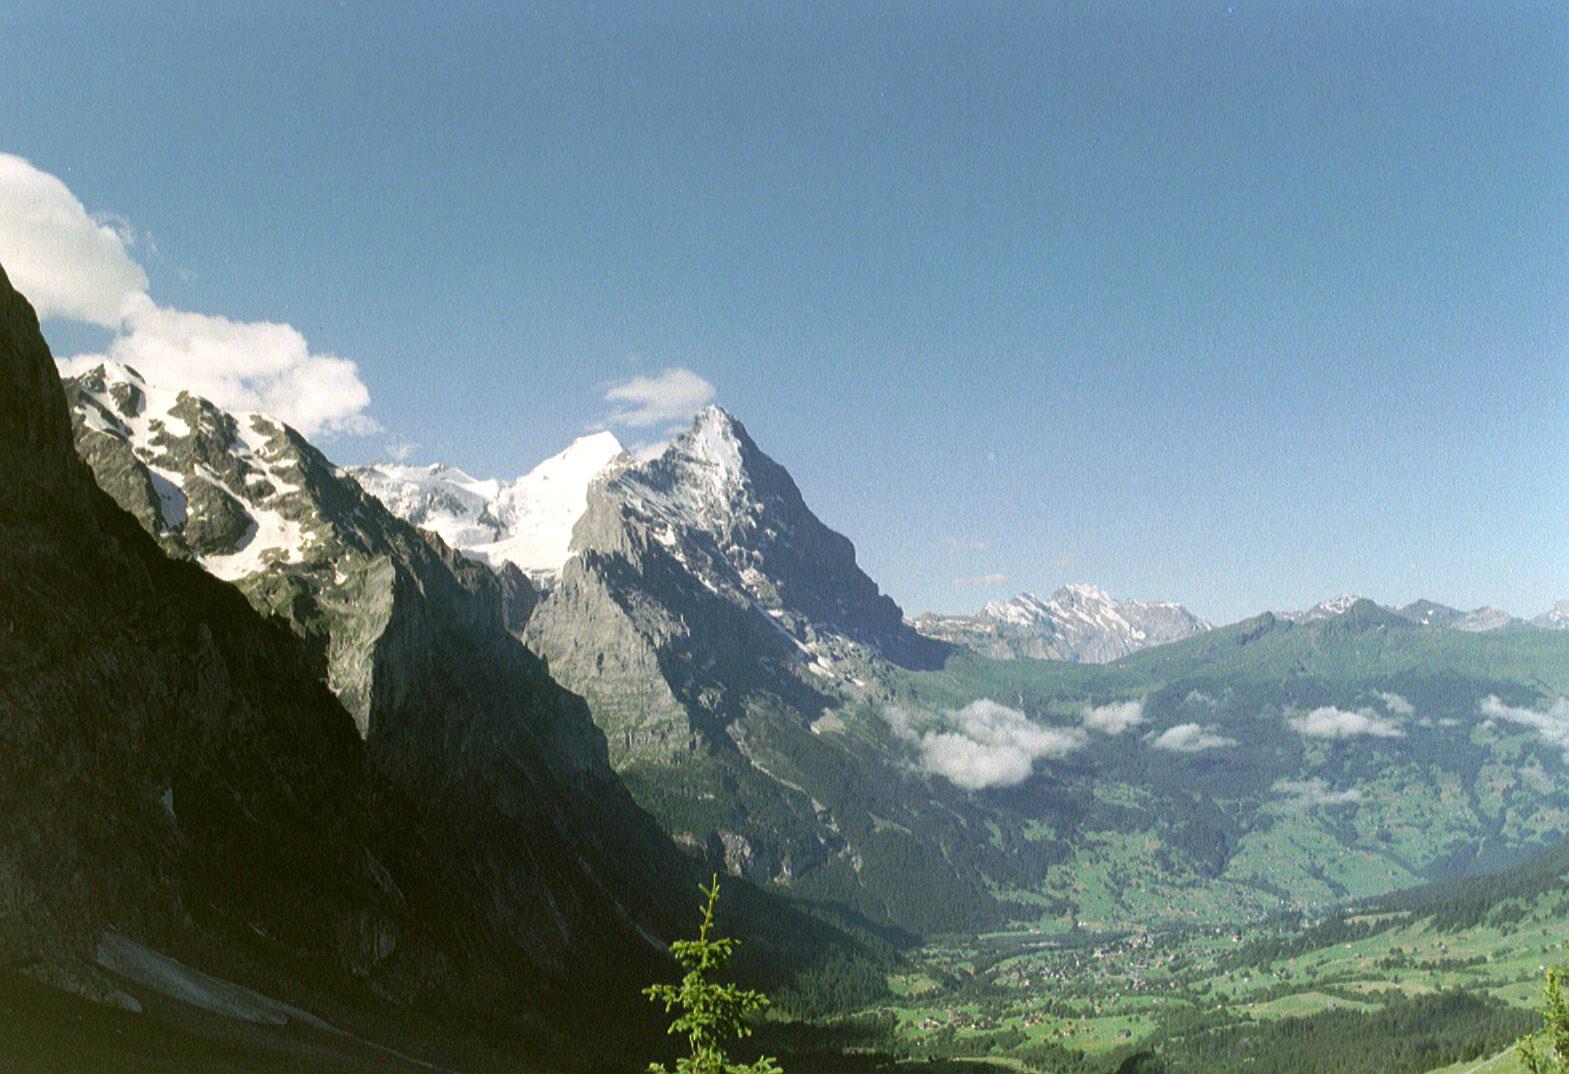 FileEiger Met Grindelwald Zwitserlandjpg Wikimedia